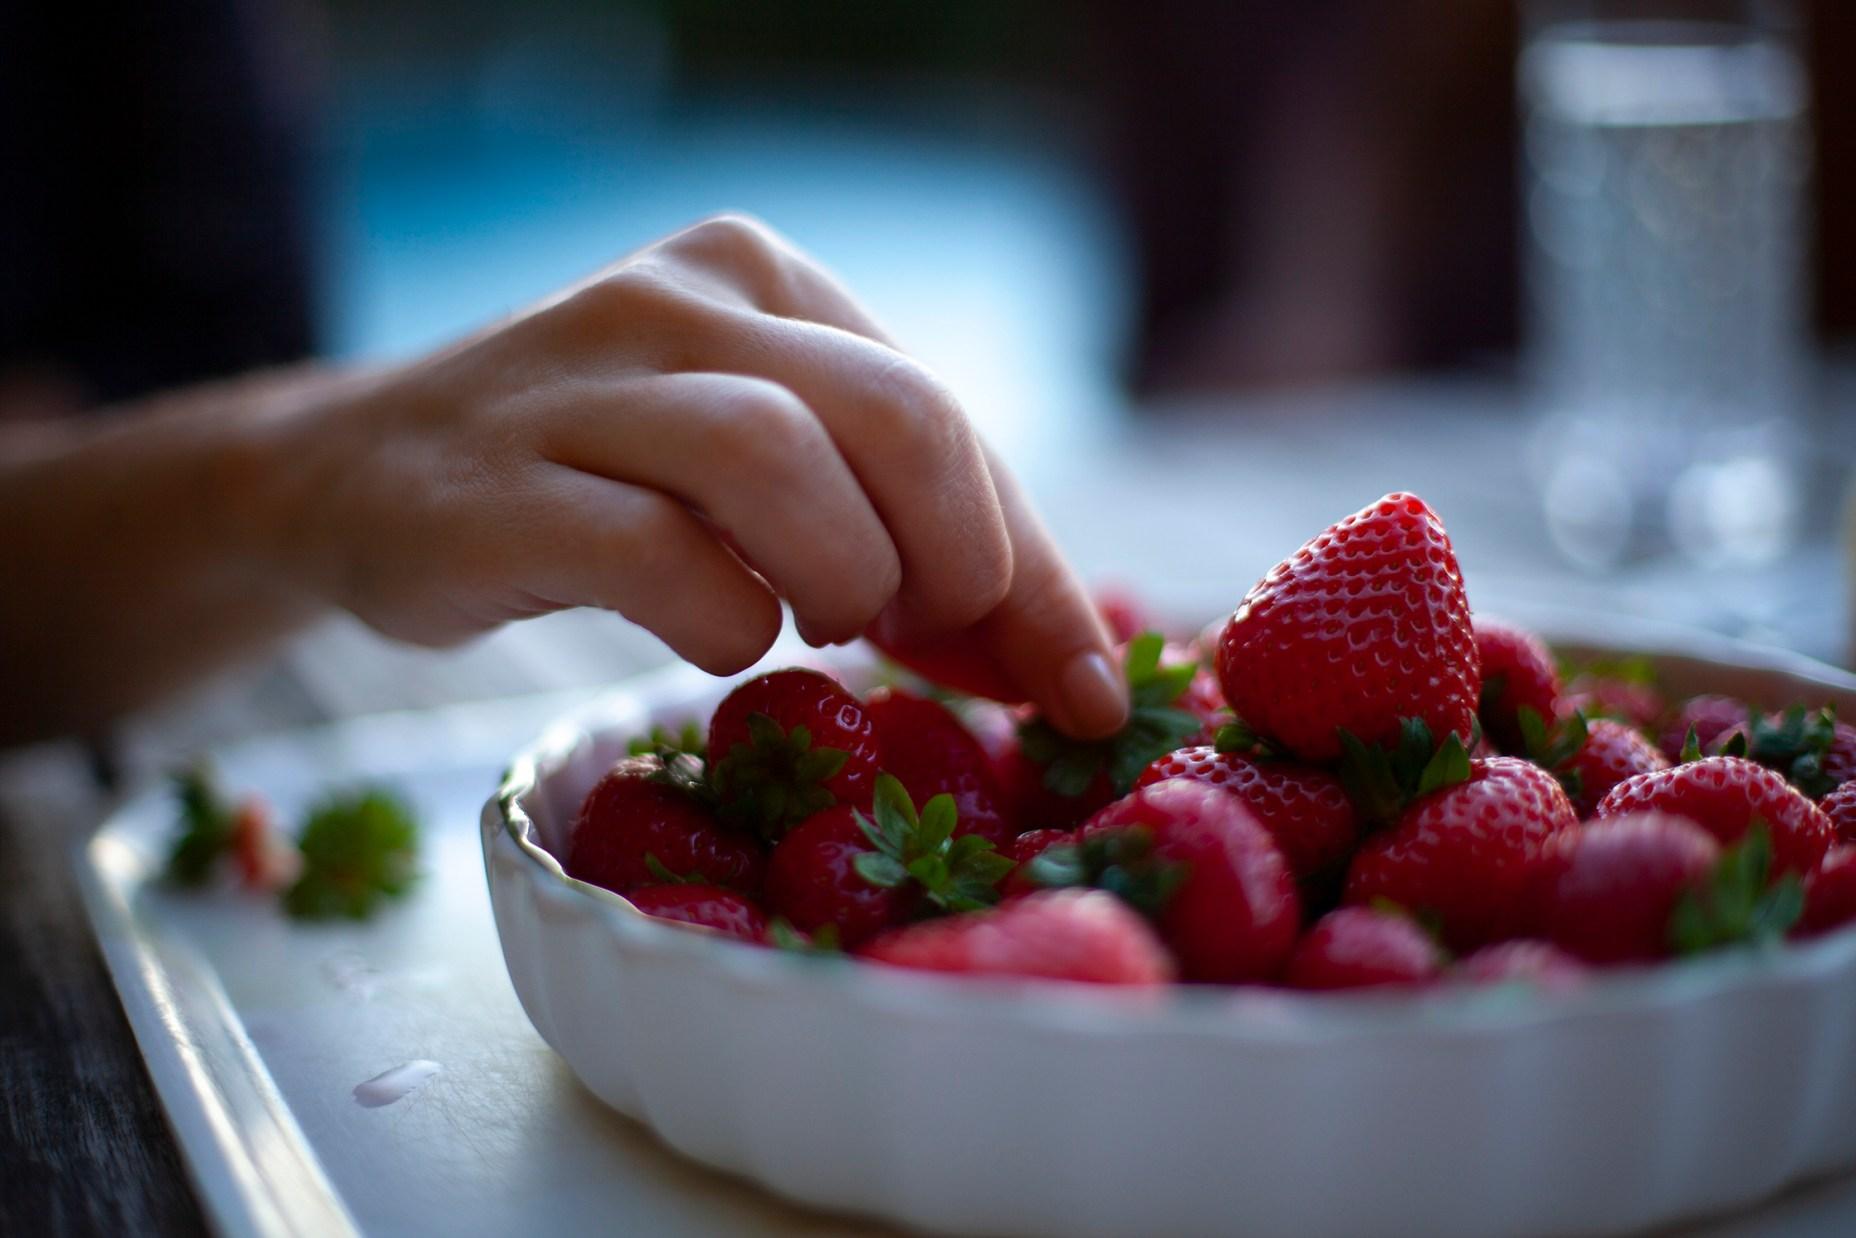 JSP Summer Strawberry pick